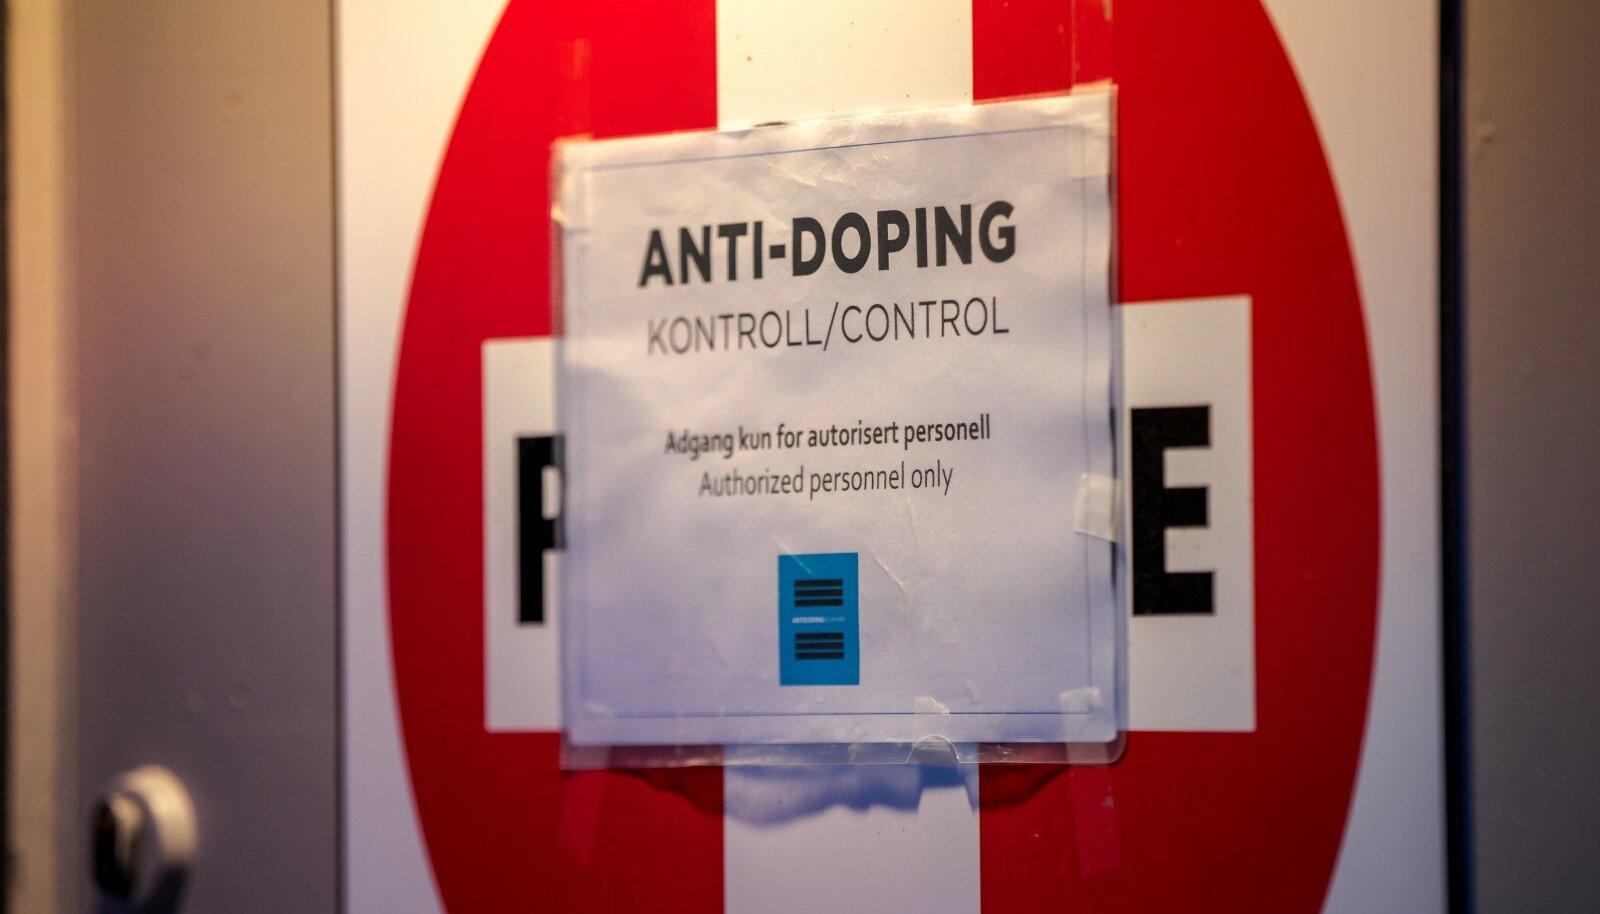 Dopingukontroll